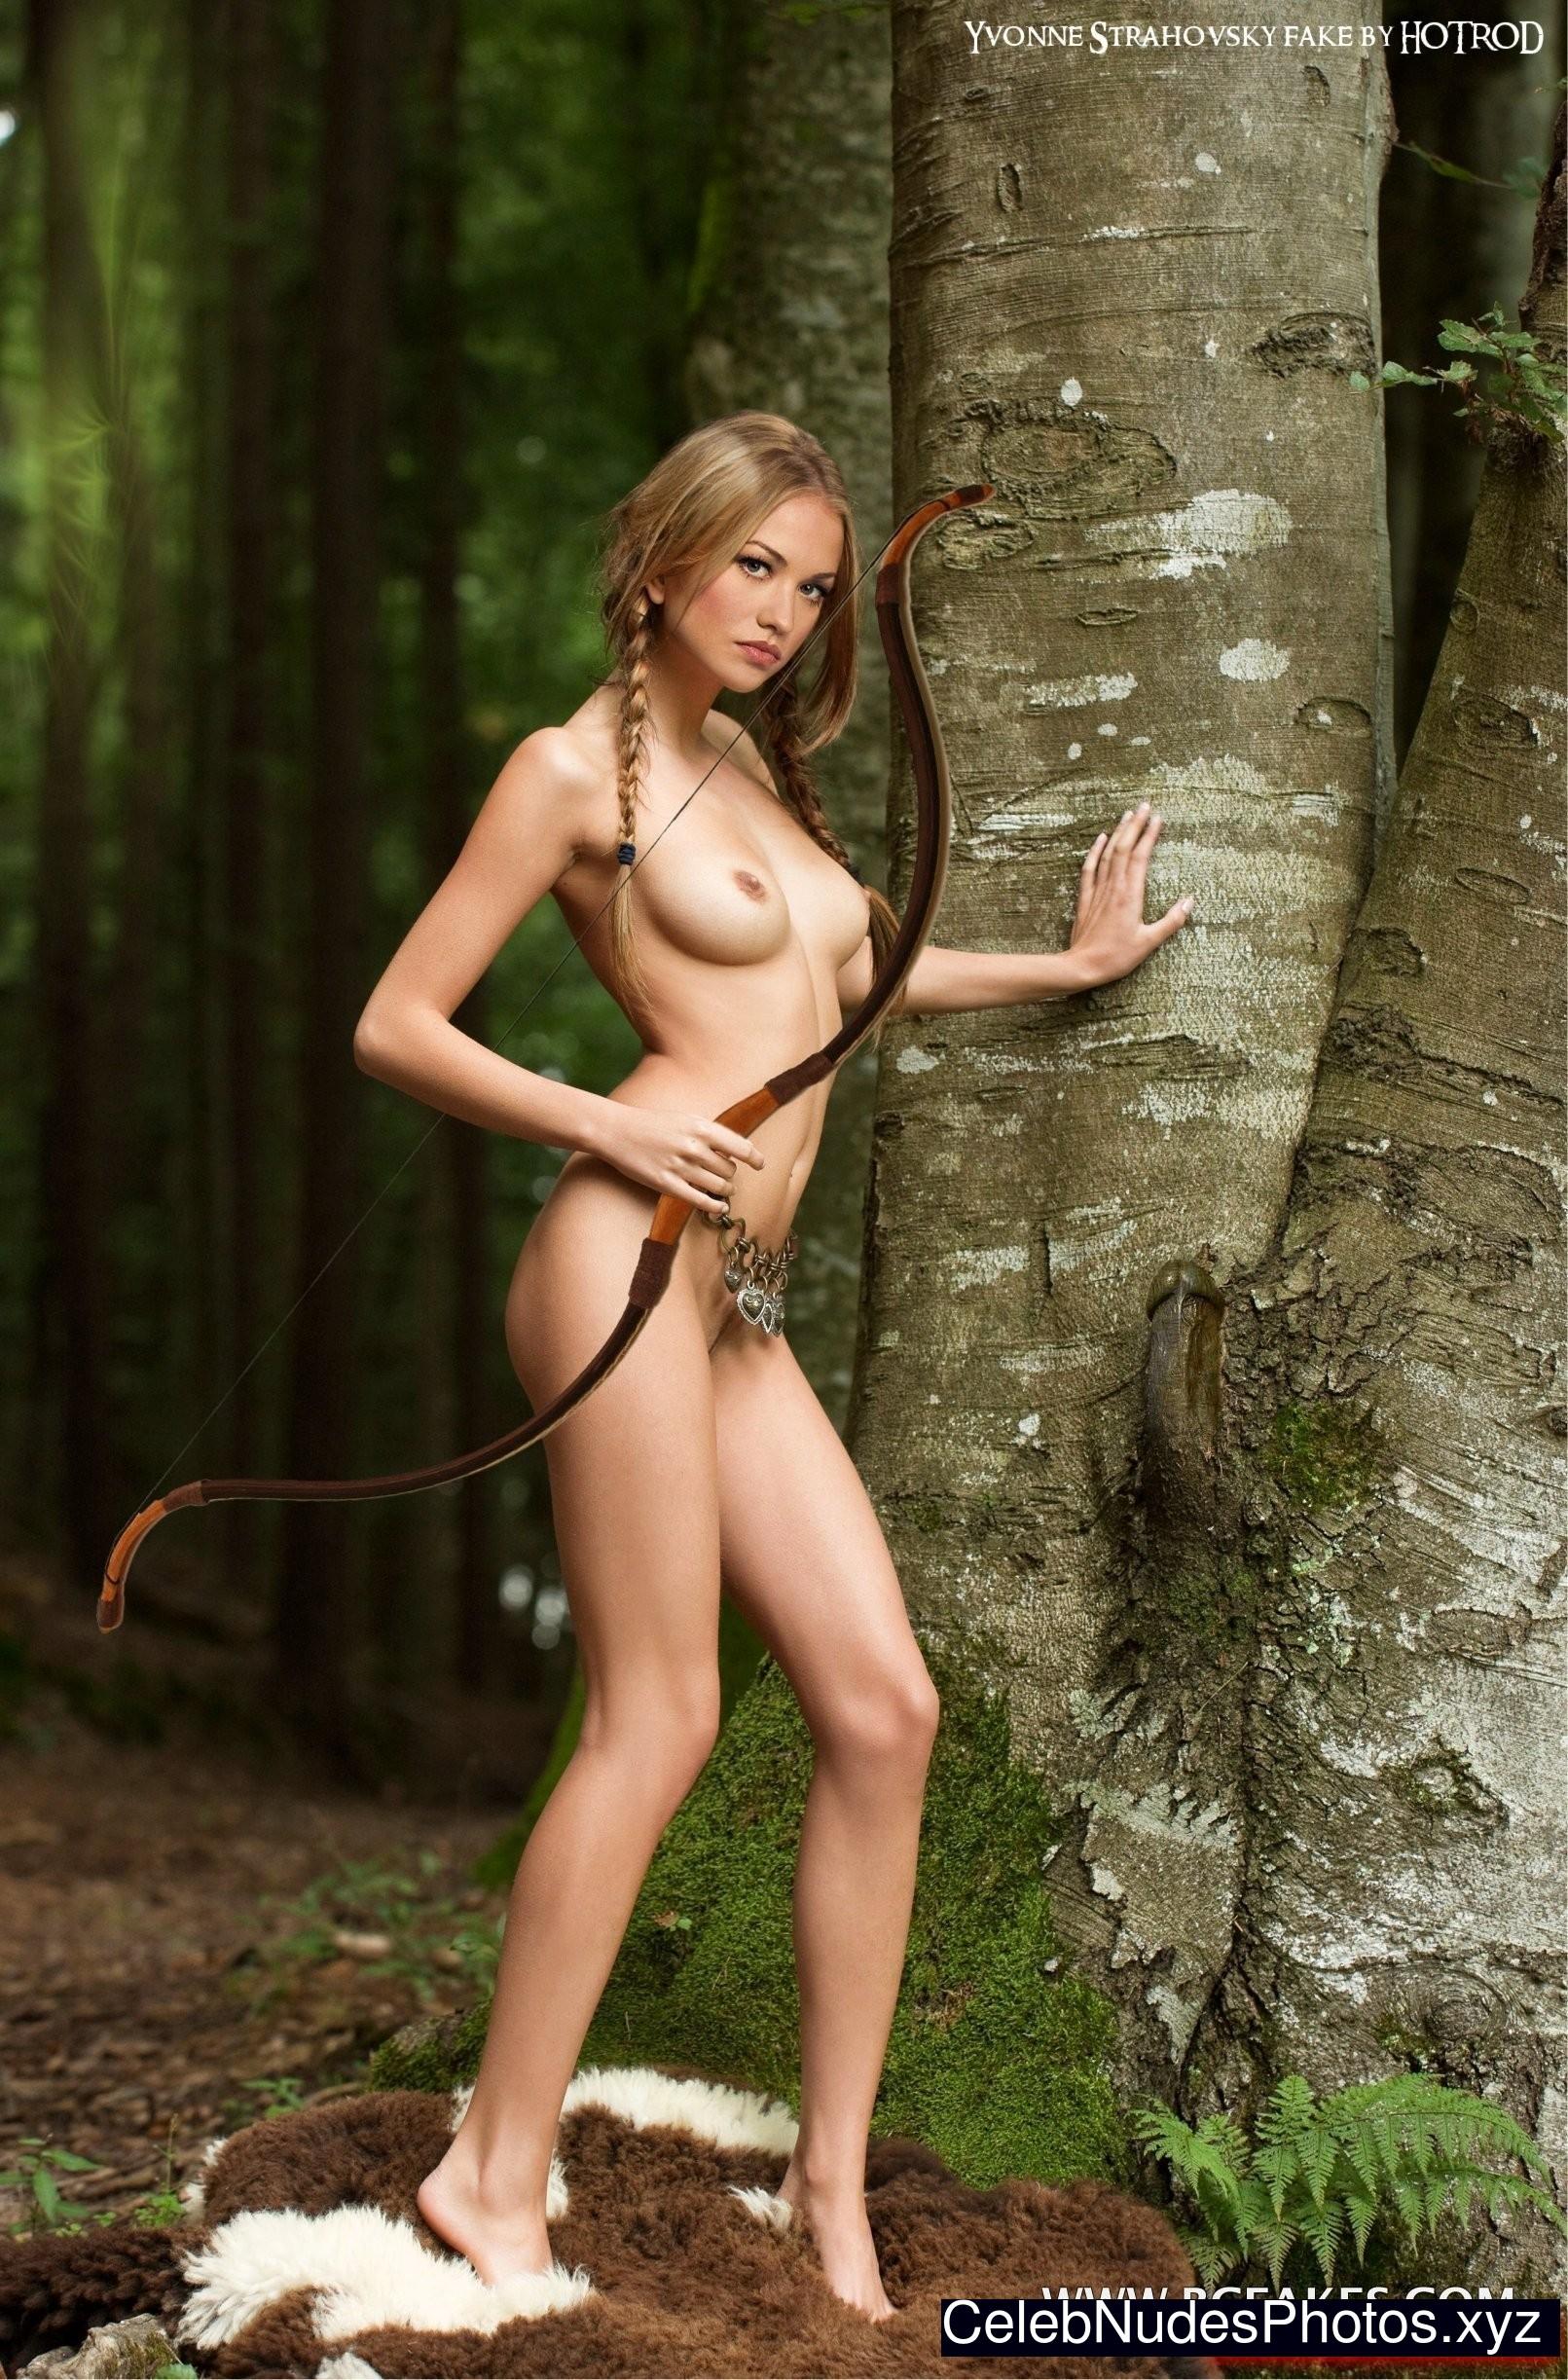 Naked girlfriend snapchat